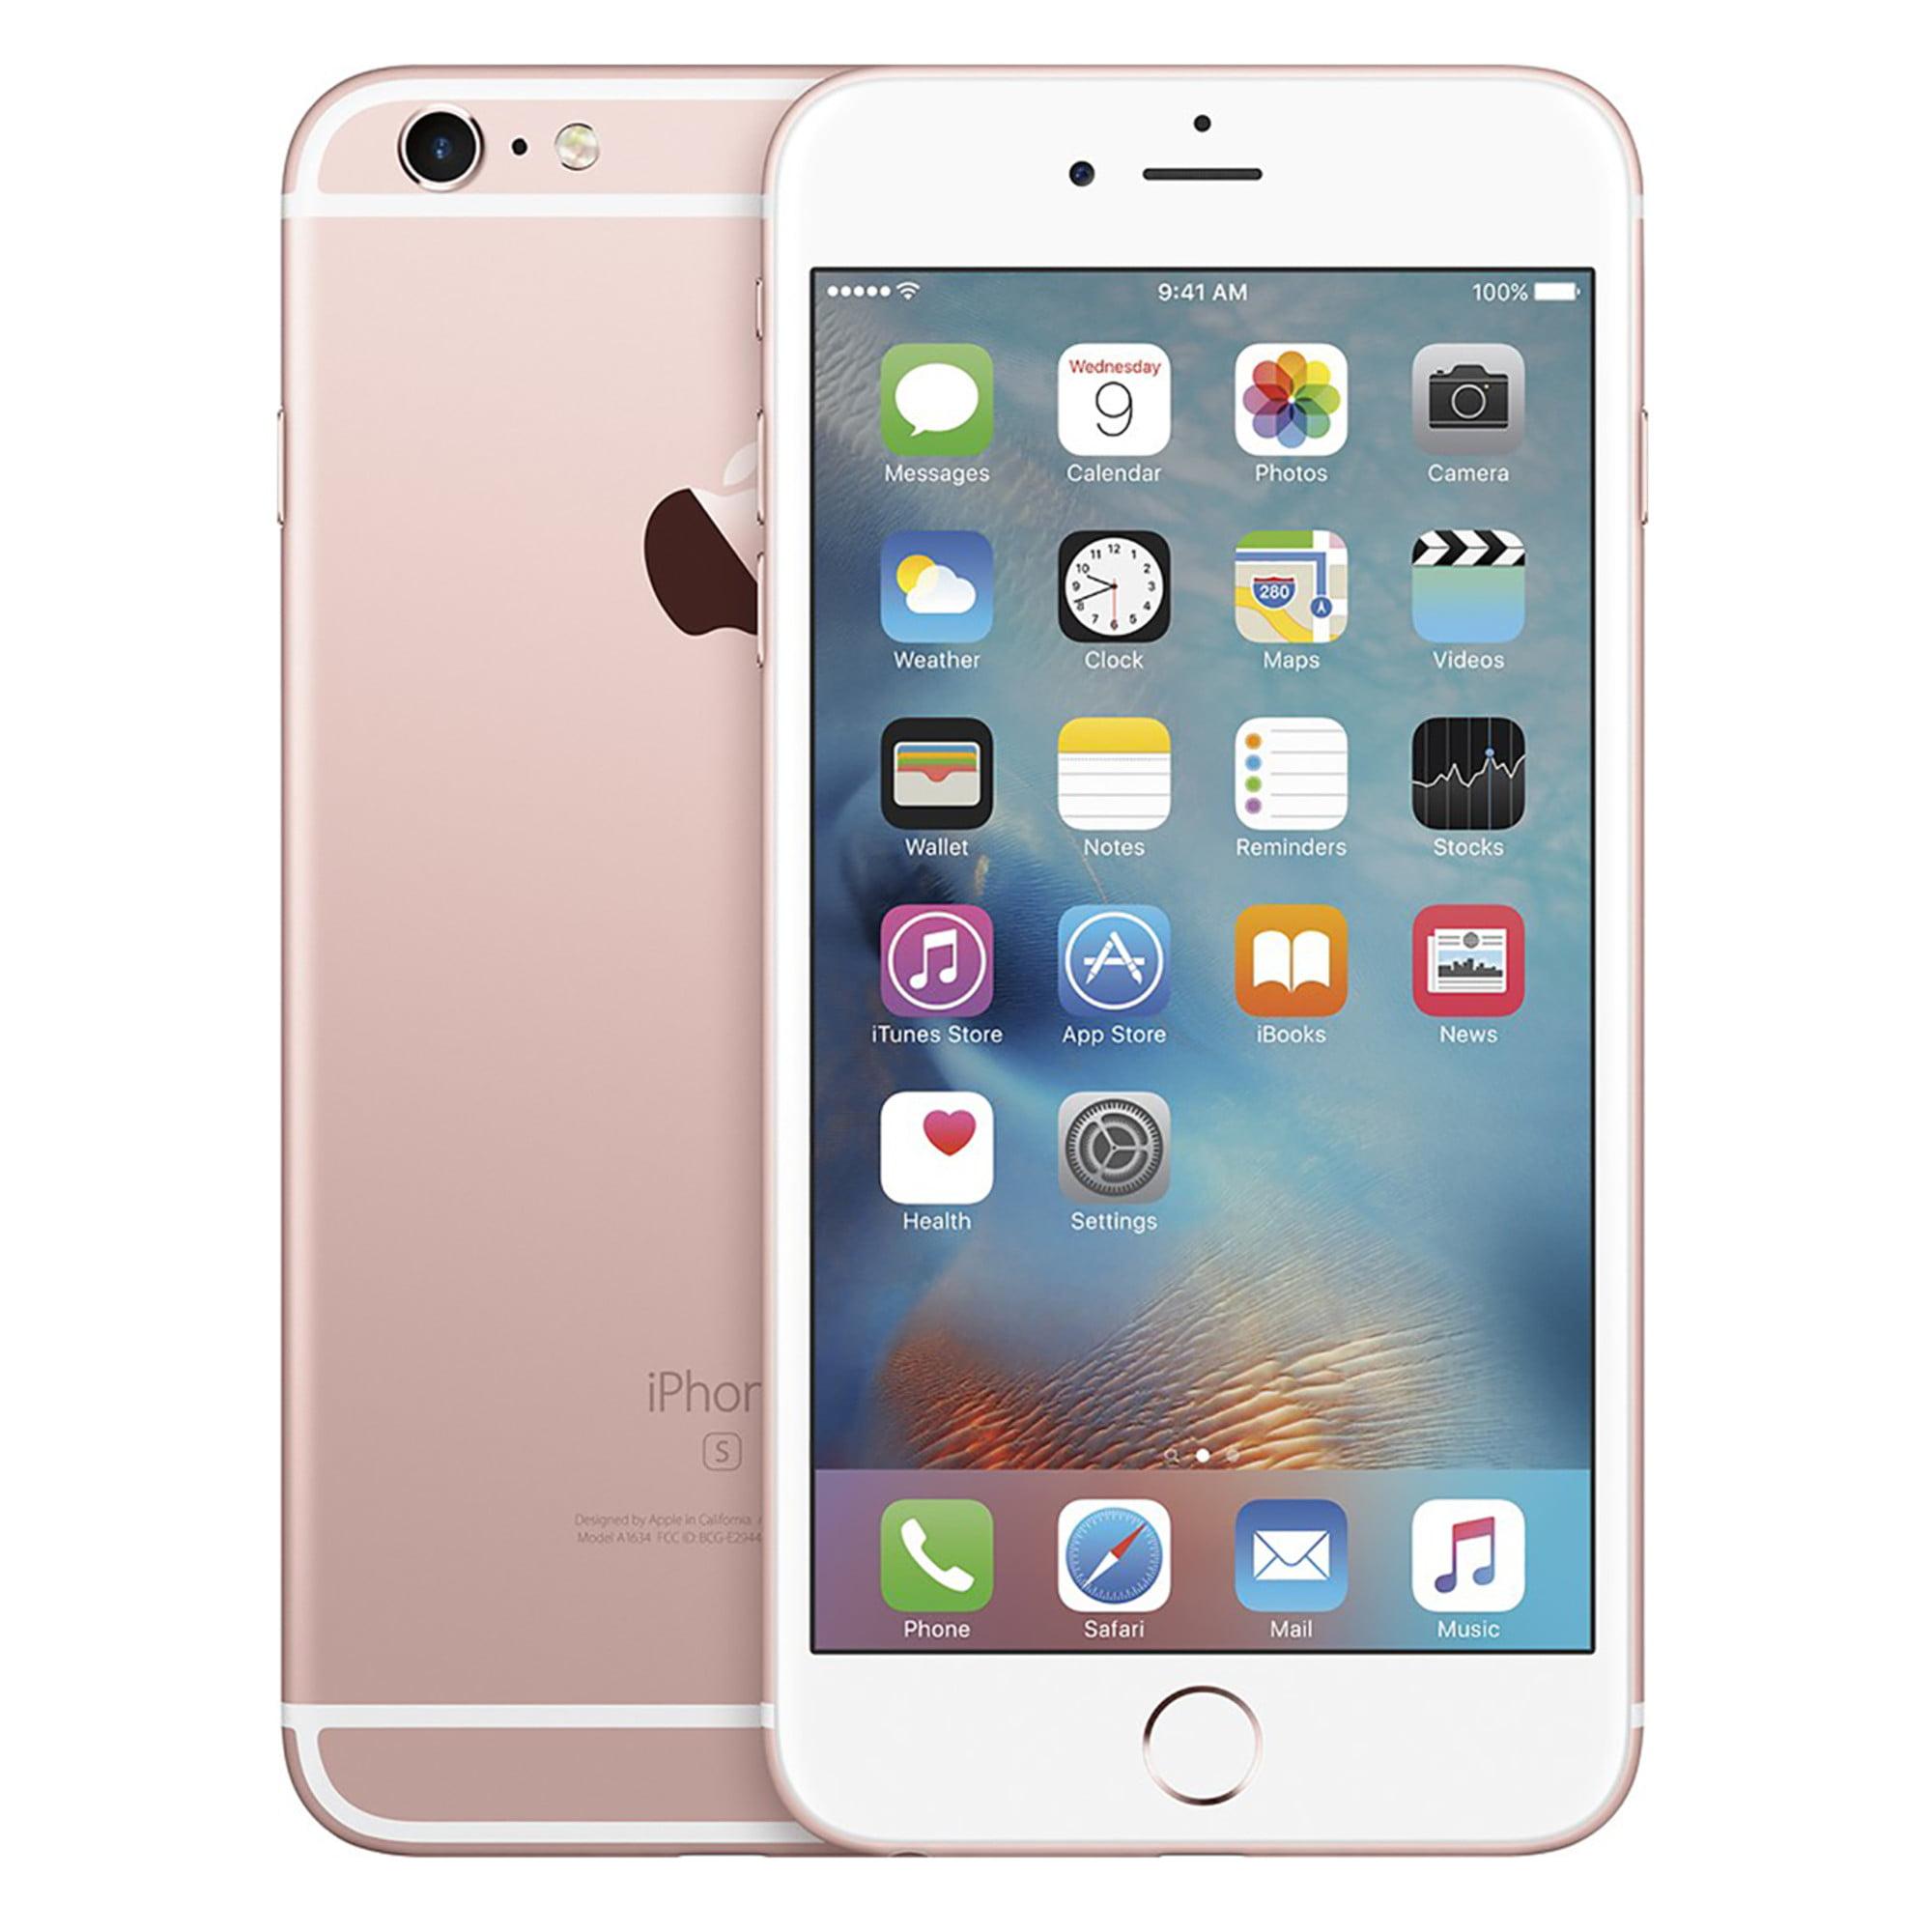 new concept 6bdad acb55 Refurbished Apple iPhone 6s Plus 128GB, Gold - Unlocked GSM/CDMA ...